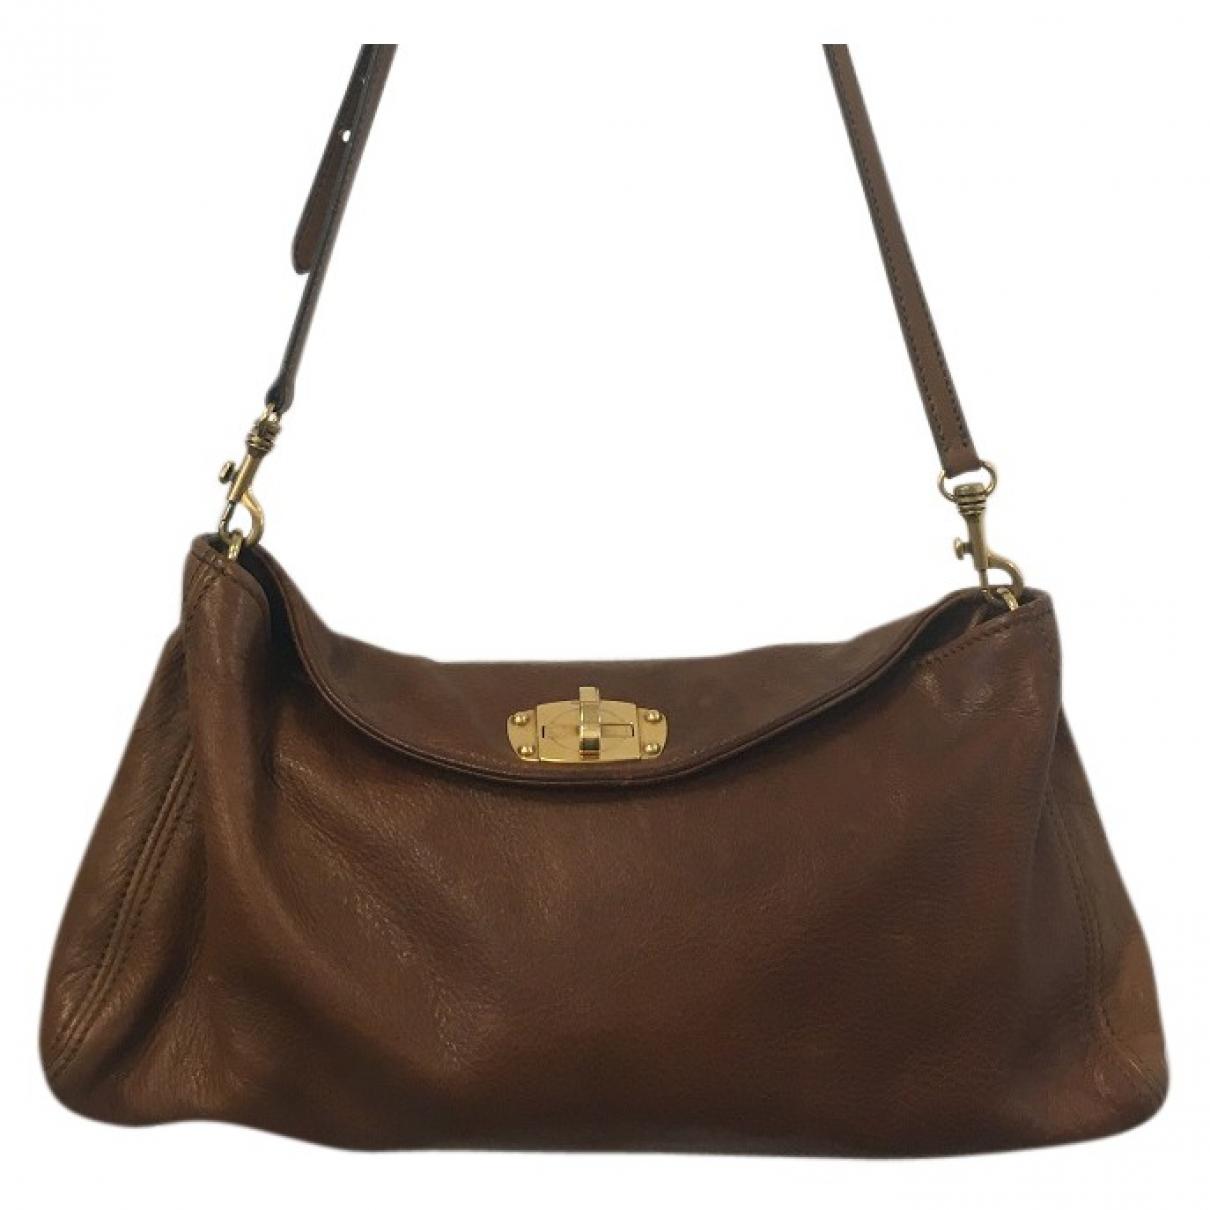 Miu Miu \N Brown Leather handbag for Women \N